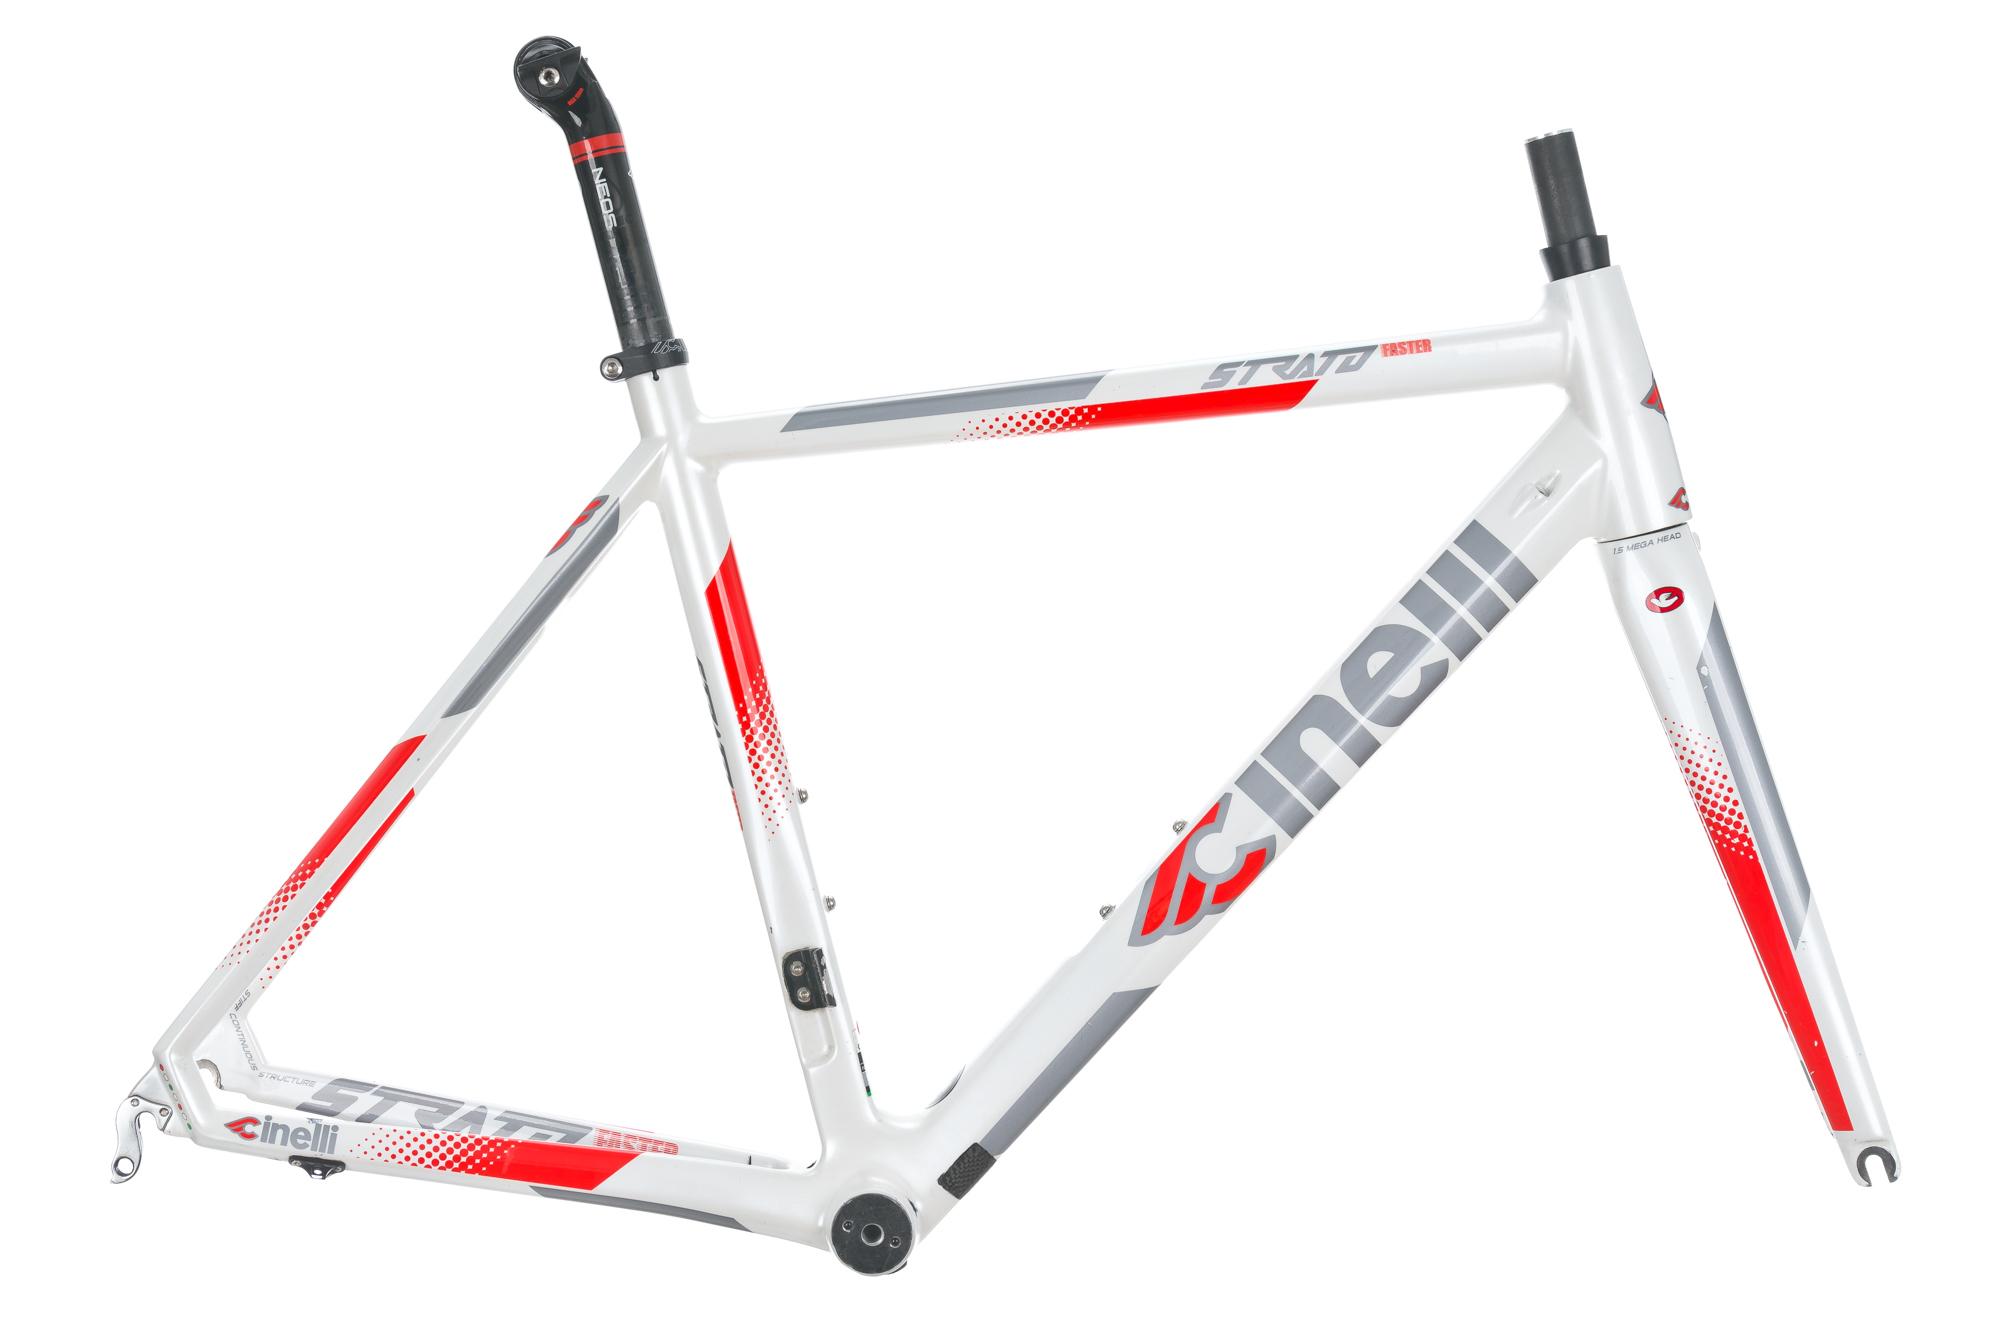 2016 Cinelli Strato Faster Road Bike Frame Set MEDIUM Carbon | eBay